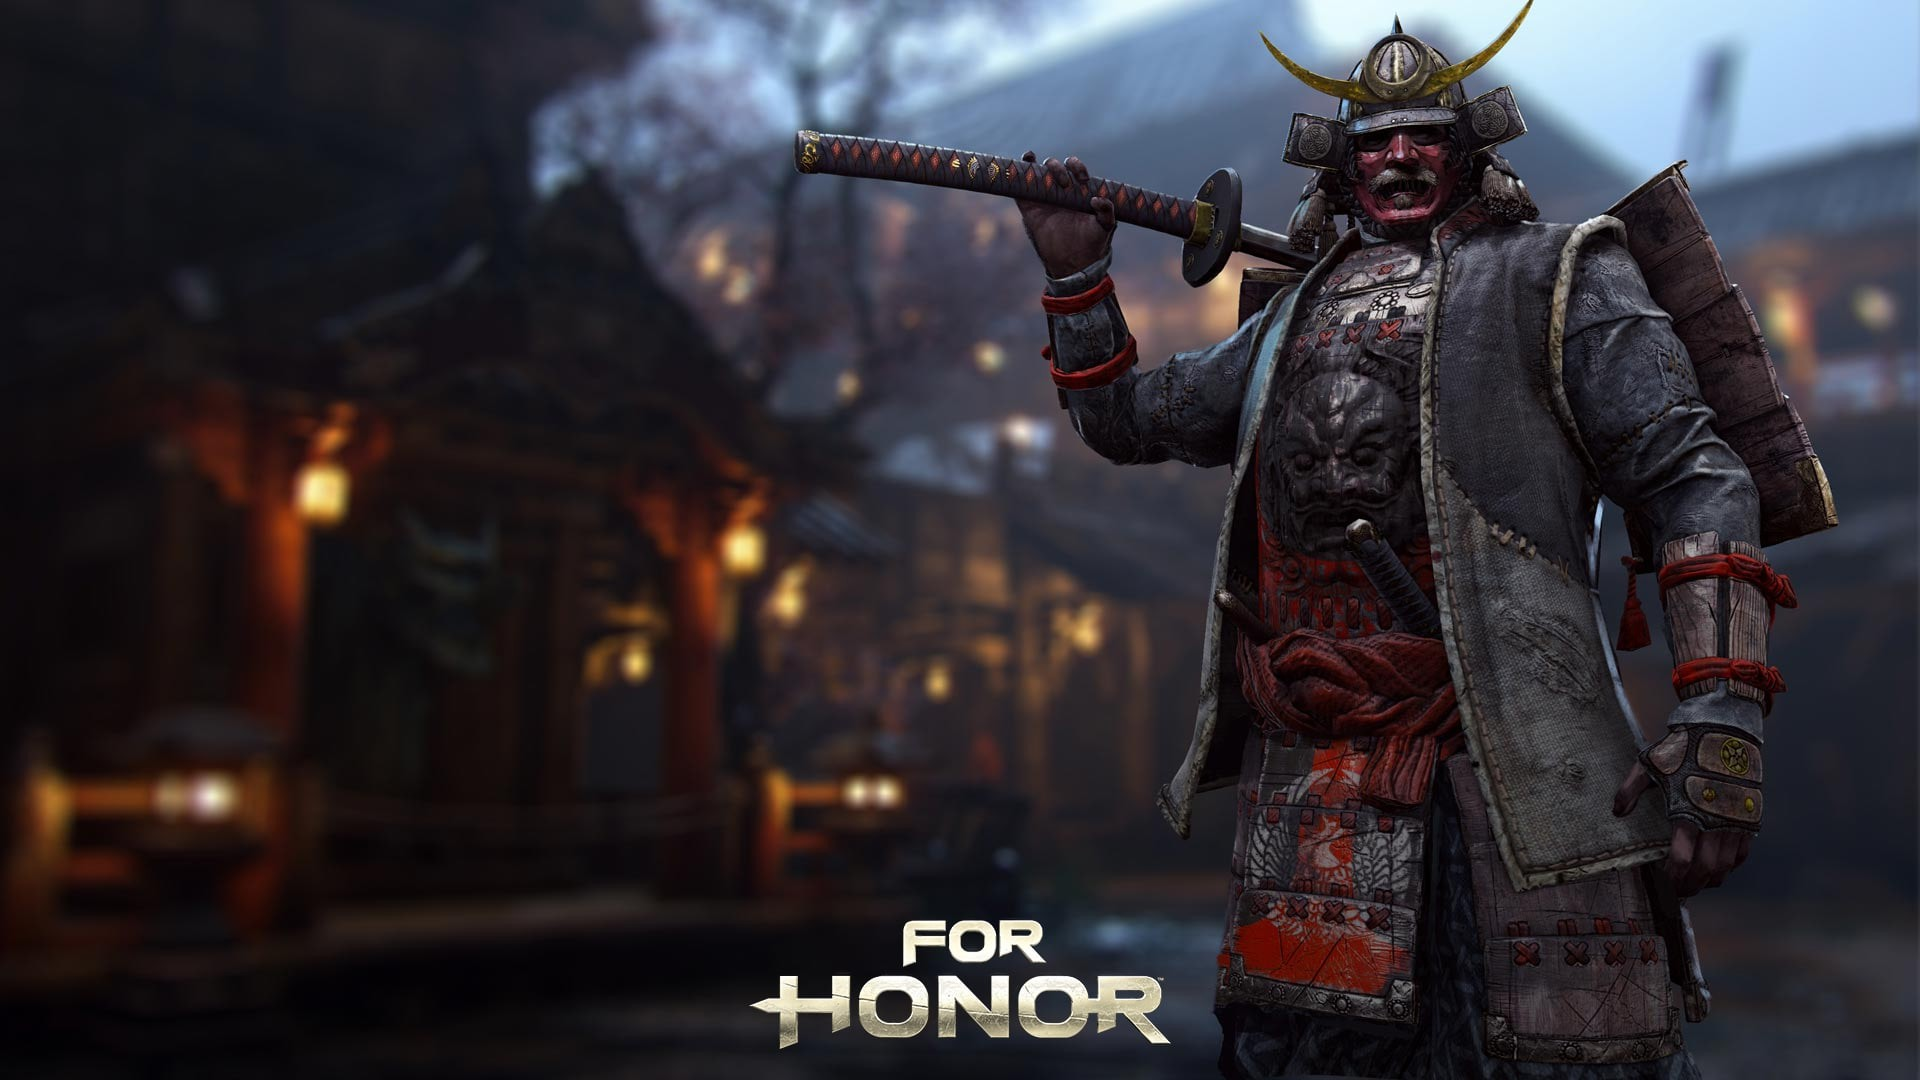 Res: 1920x1080, For Honor Samurai Warrior hd wallpaper